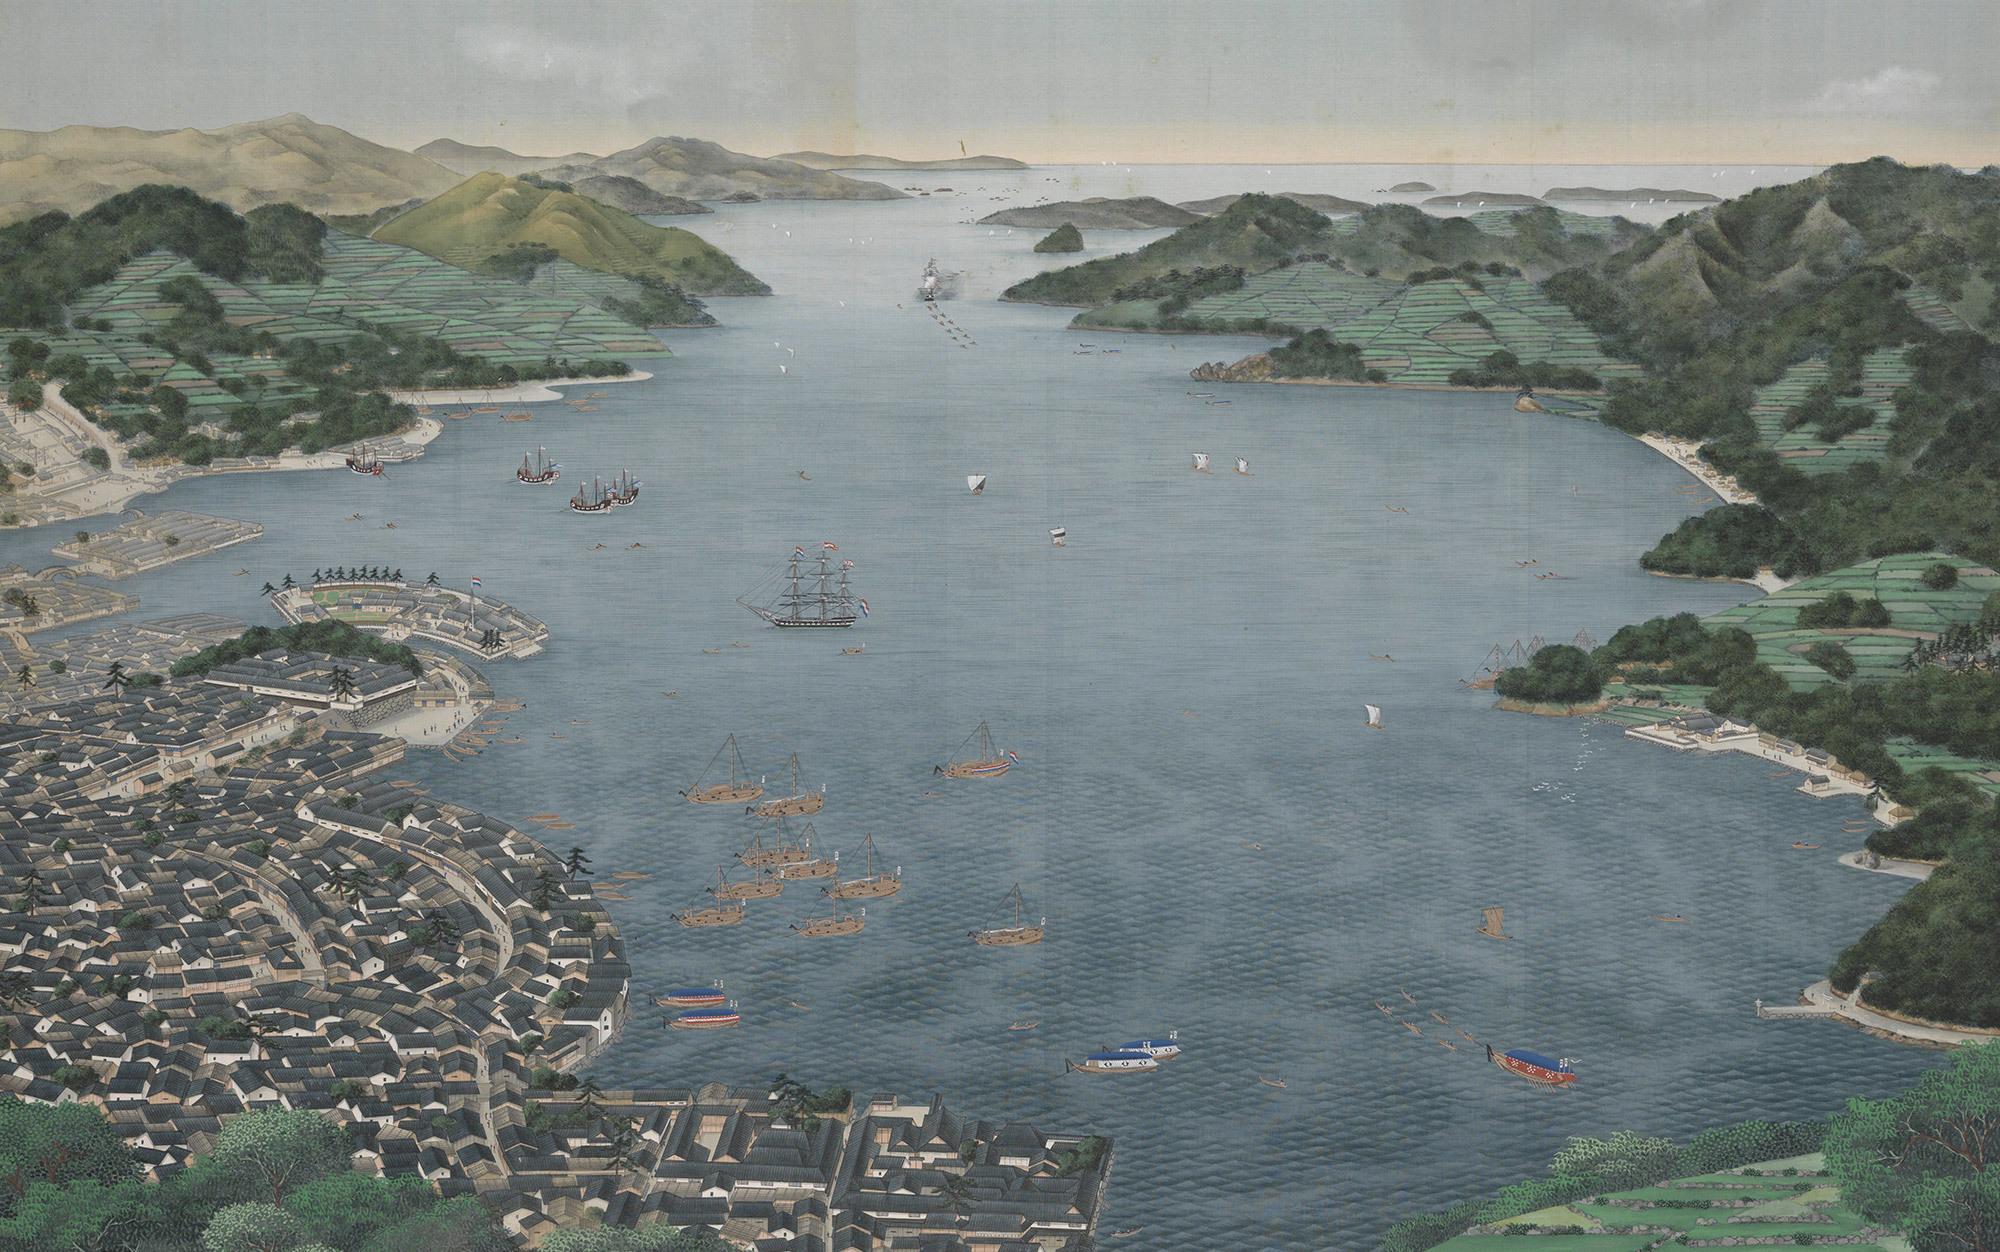 Asia had the upper hand | Aeon